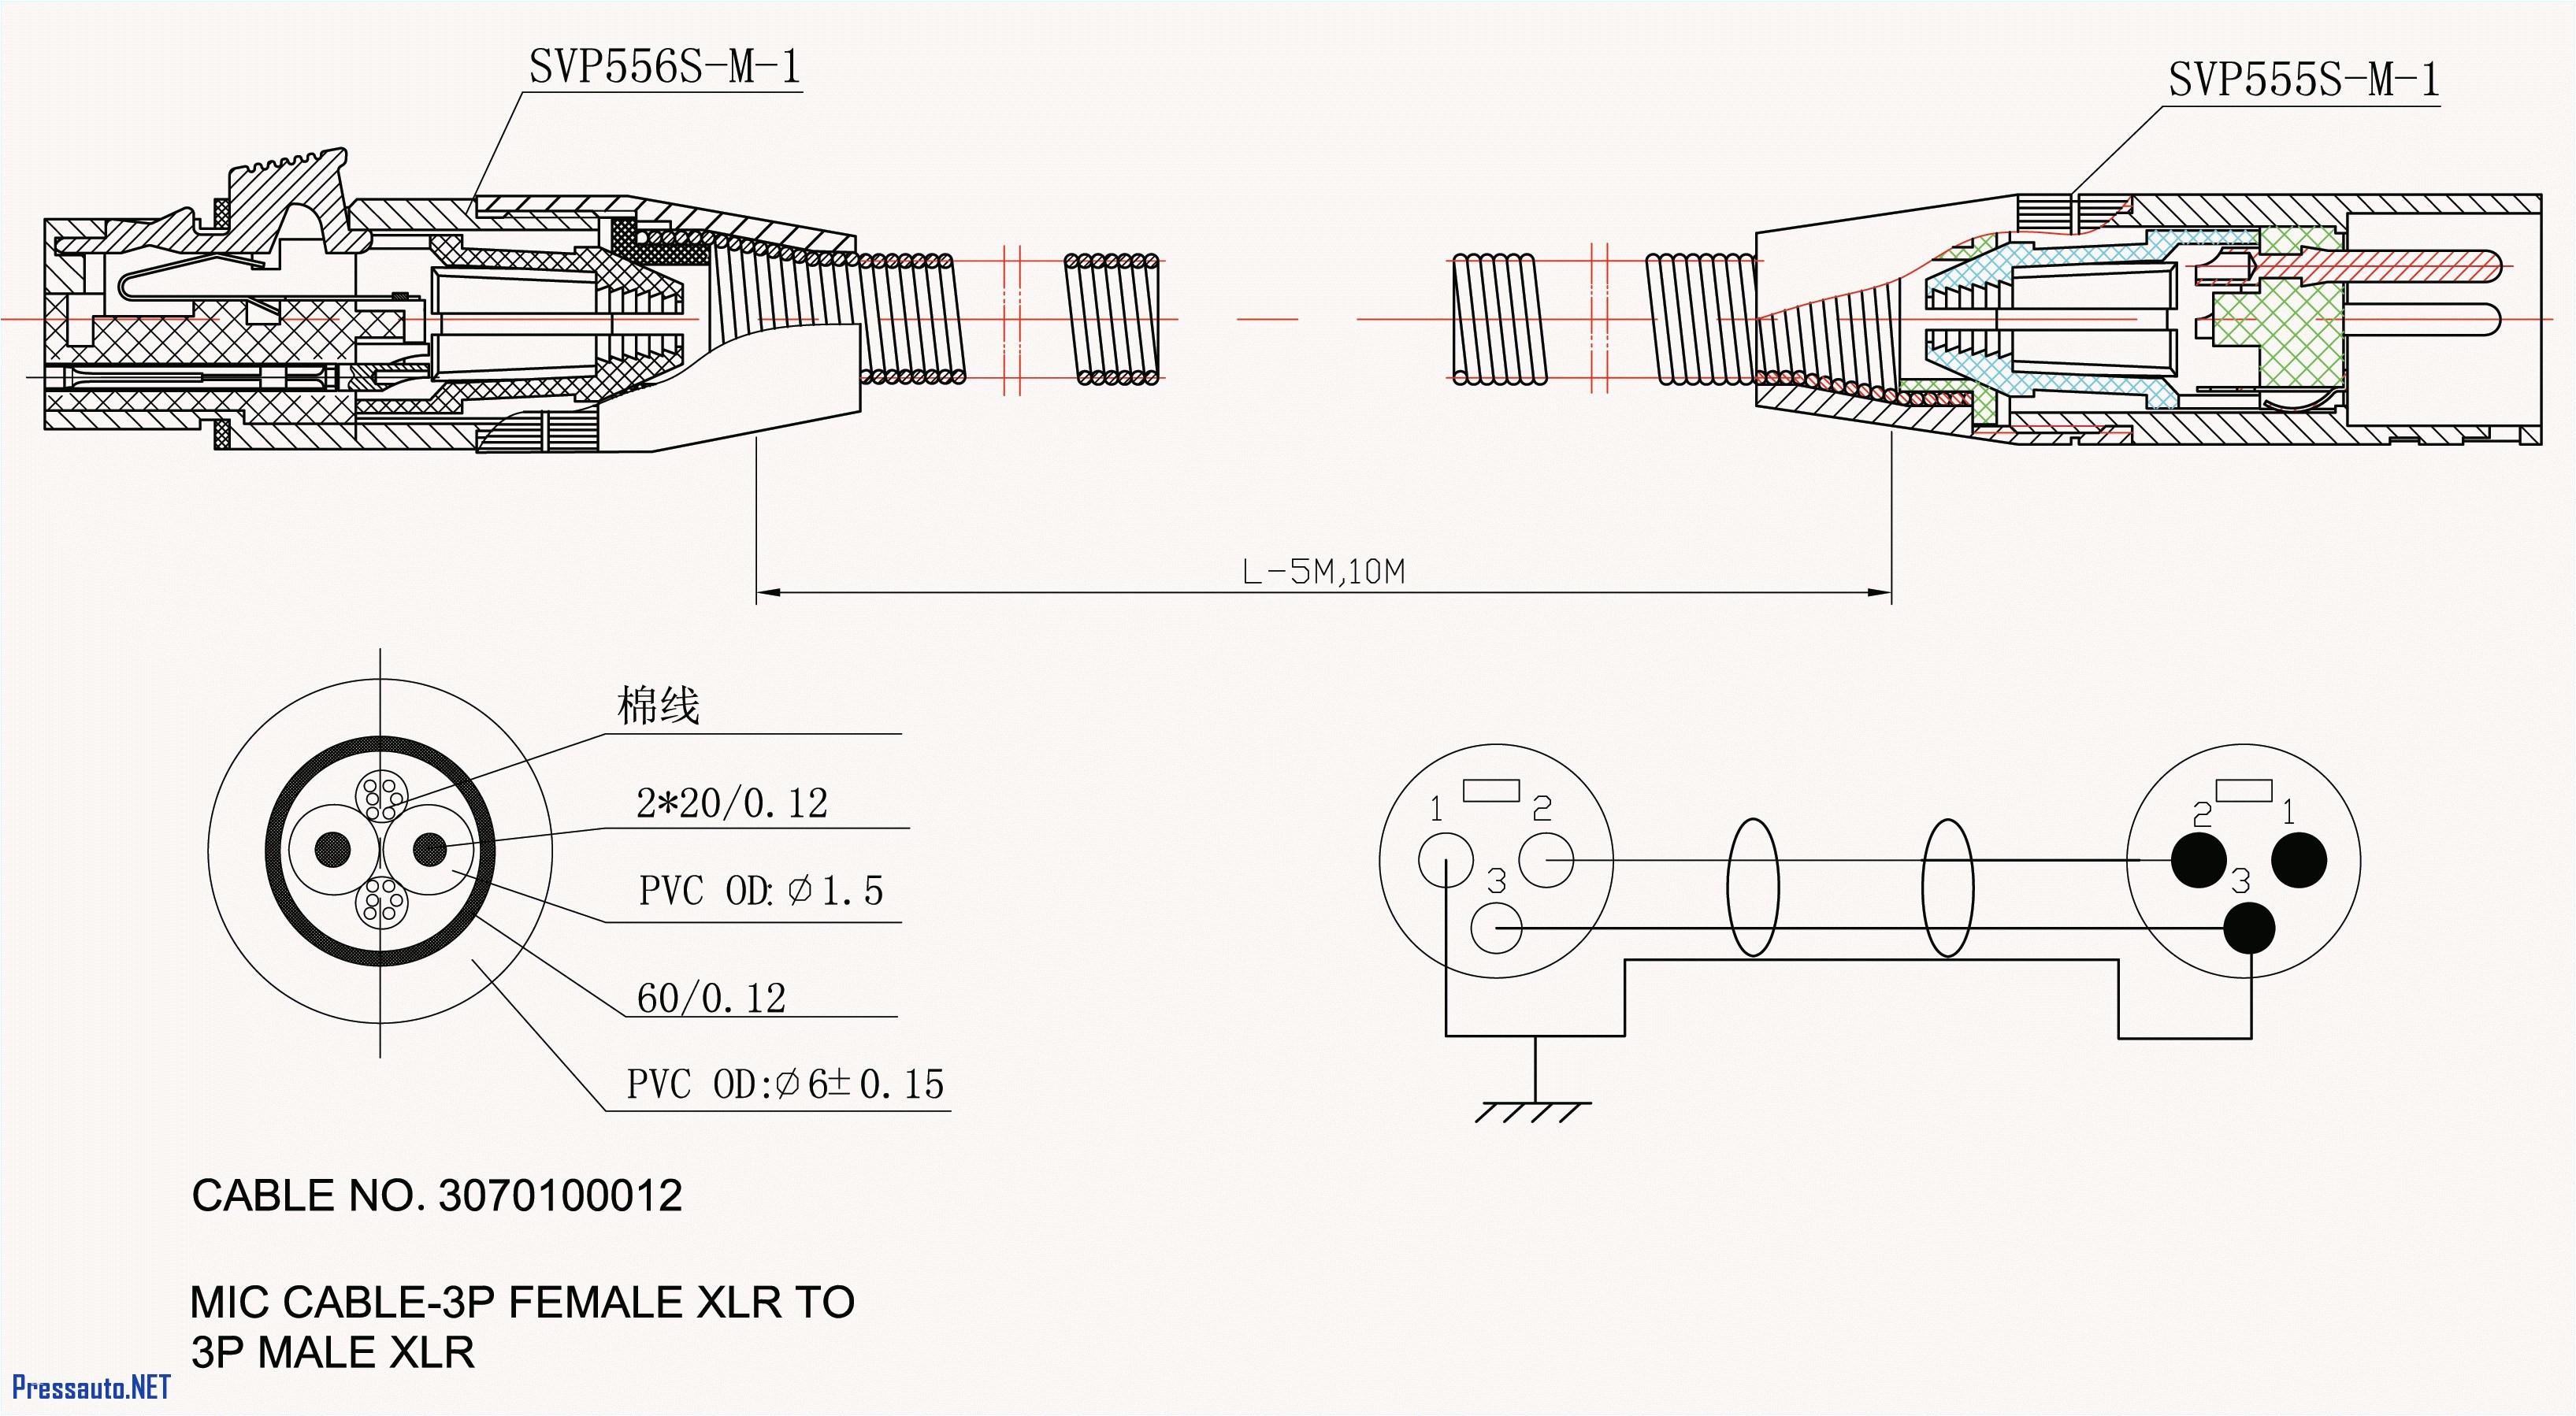 zig cf9 wiring diagram inspirational wiring diagram steinbock boss pe25 archives ipphil wiring diagram jpg